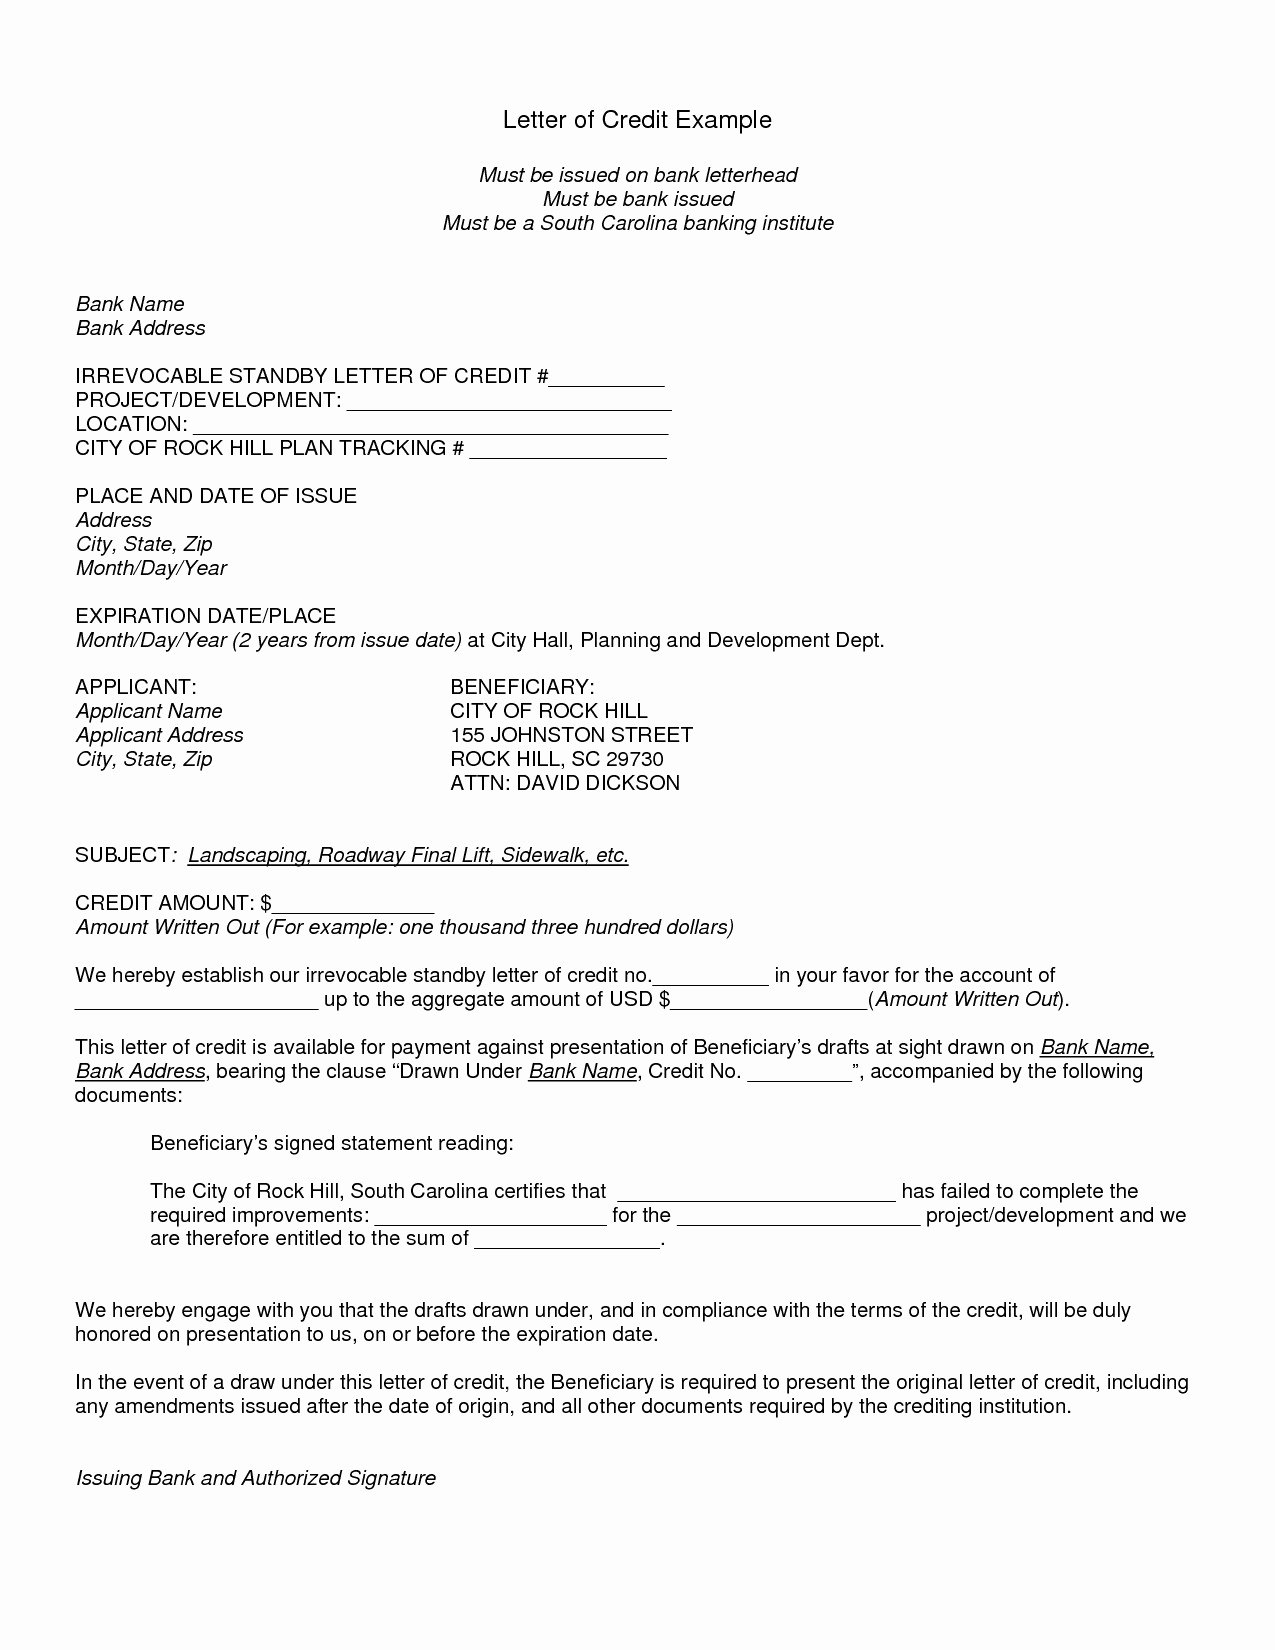 Letter Of Credit Template Elegant Letter Credit format Union Bank India